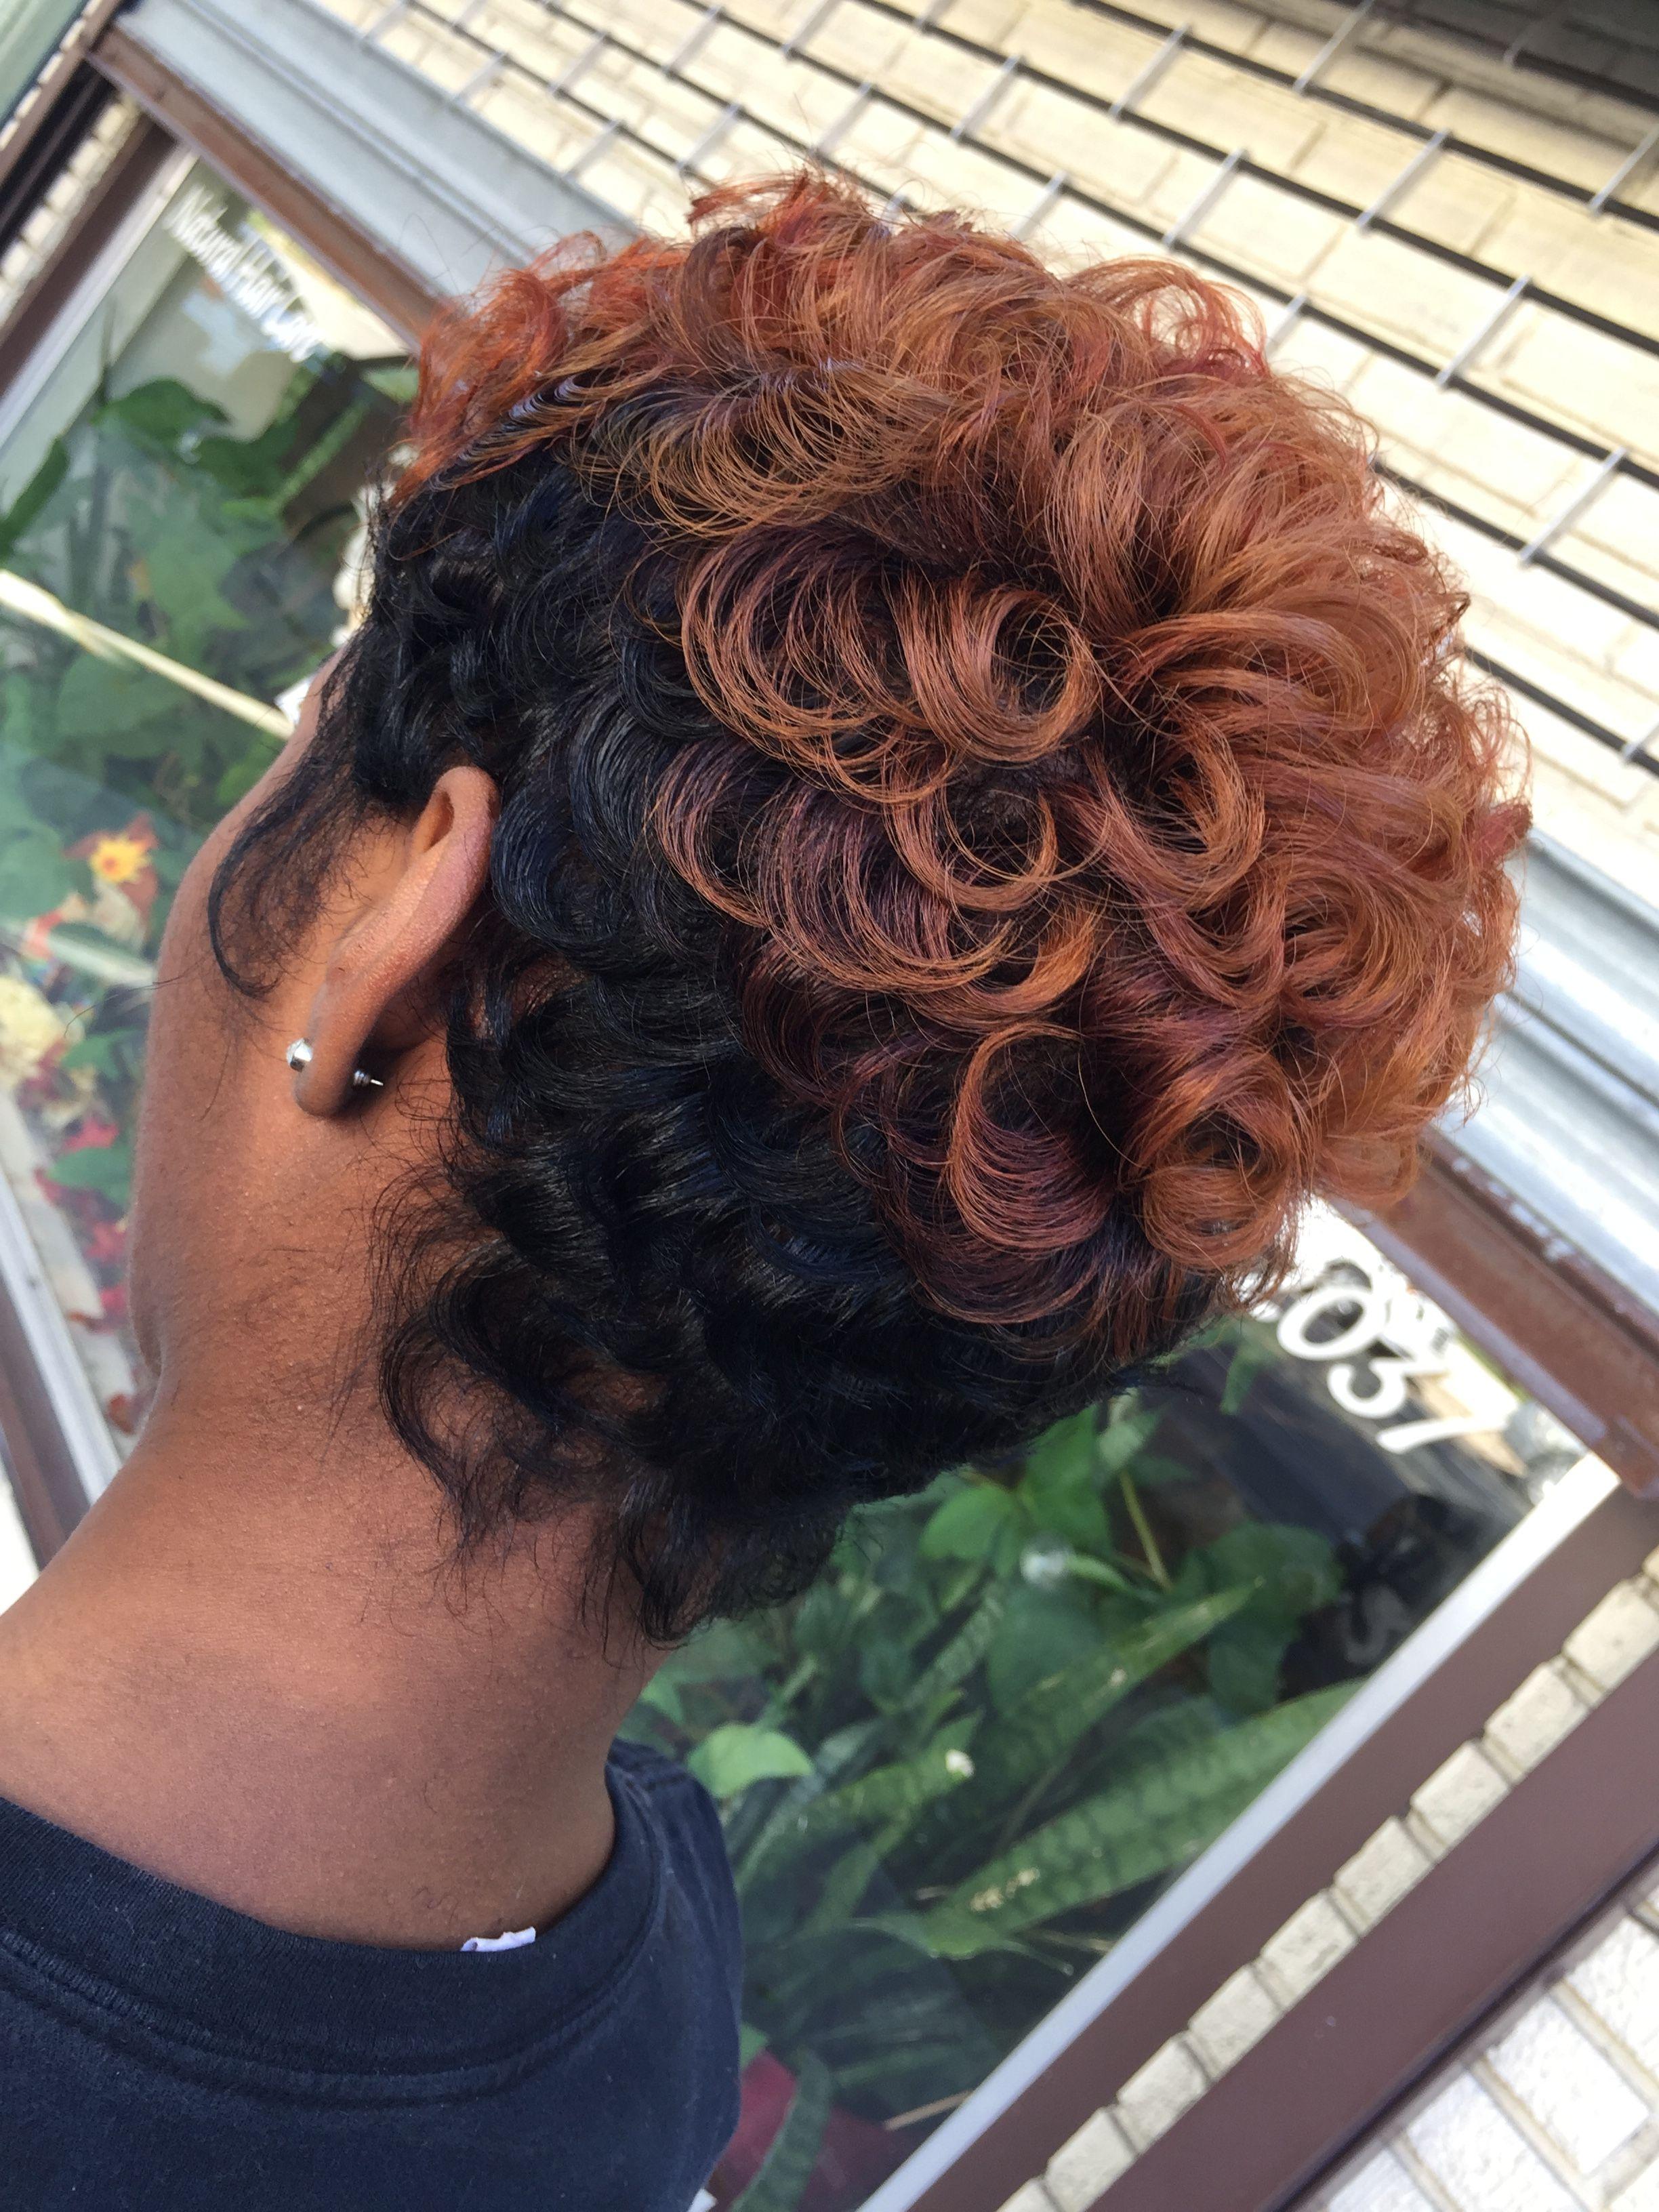 Relaxer Free Hair She S Been Heatherfyed Le Loft Llc Hair Salon Philadelphia Pa Stylist Marty 215 222 2037 Natural Hair Styles Short Hair Styles Free Hair